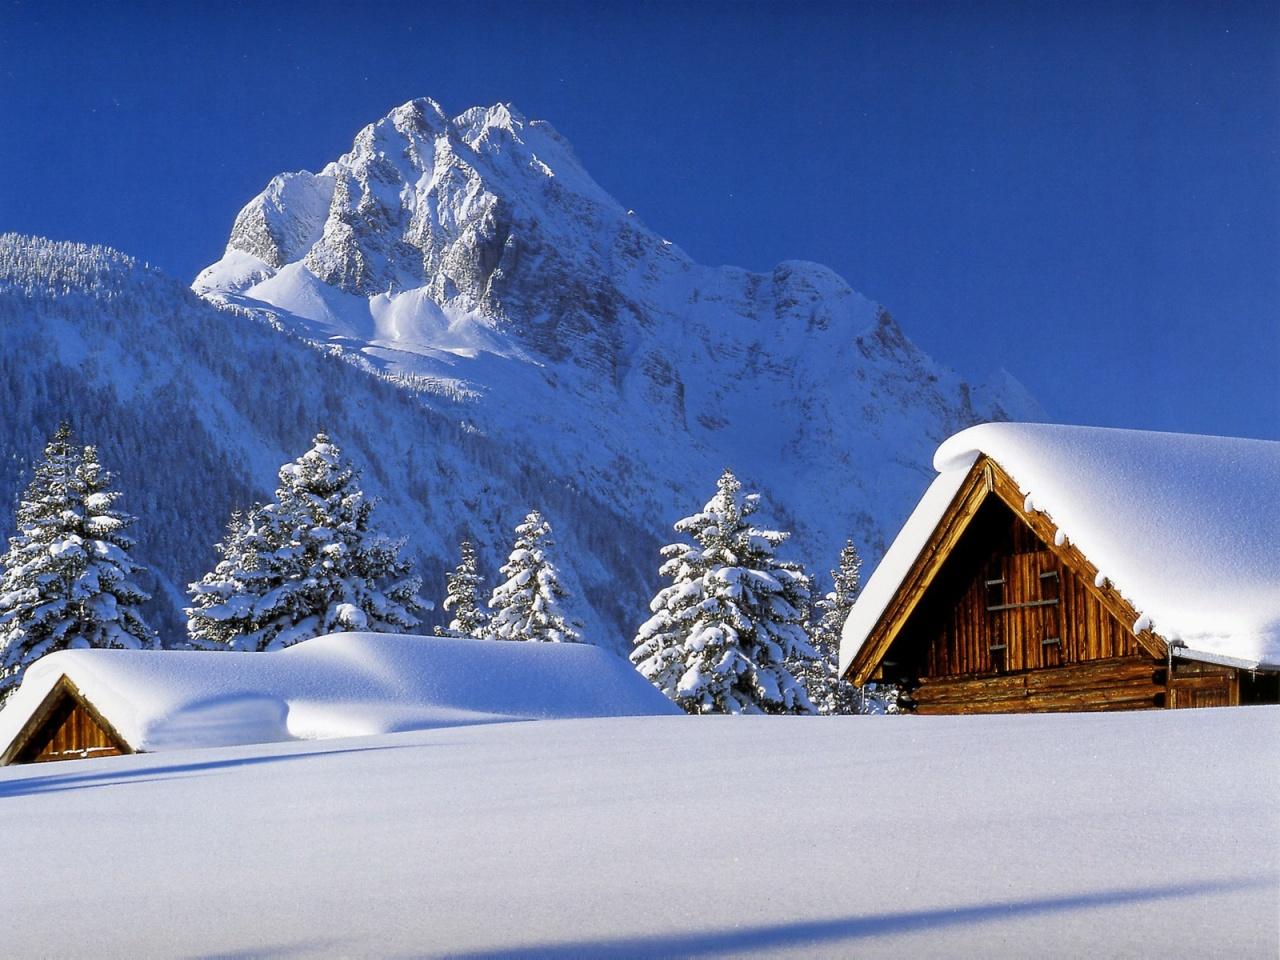 Free Wallpaper - Free Nature wallpaper - Winter Wonderland 2 ...